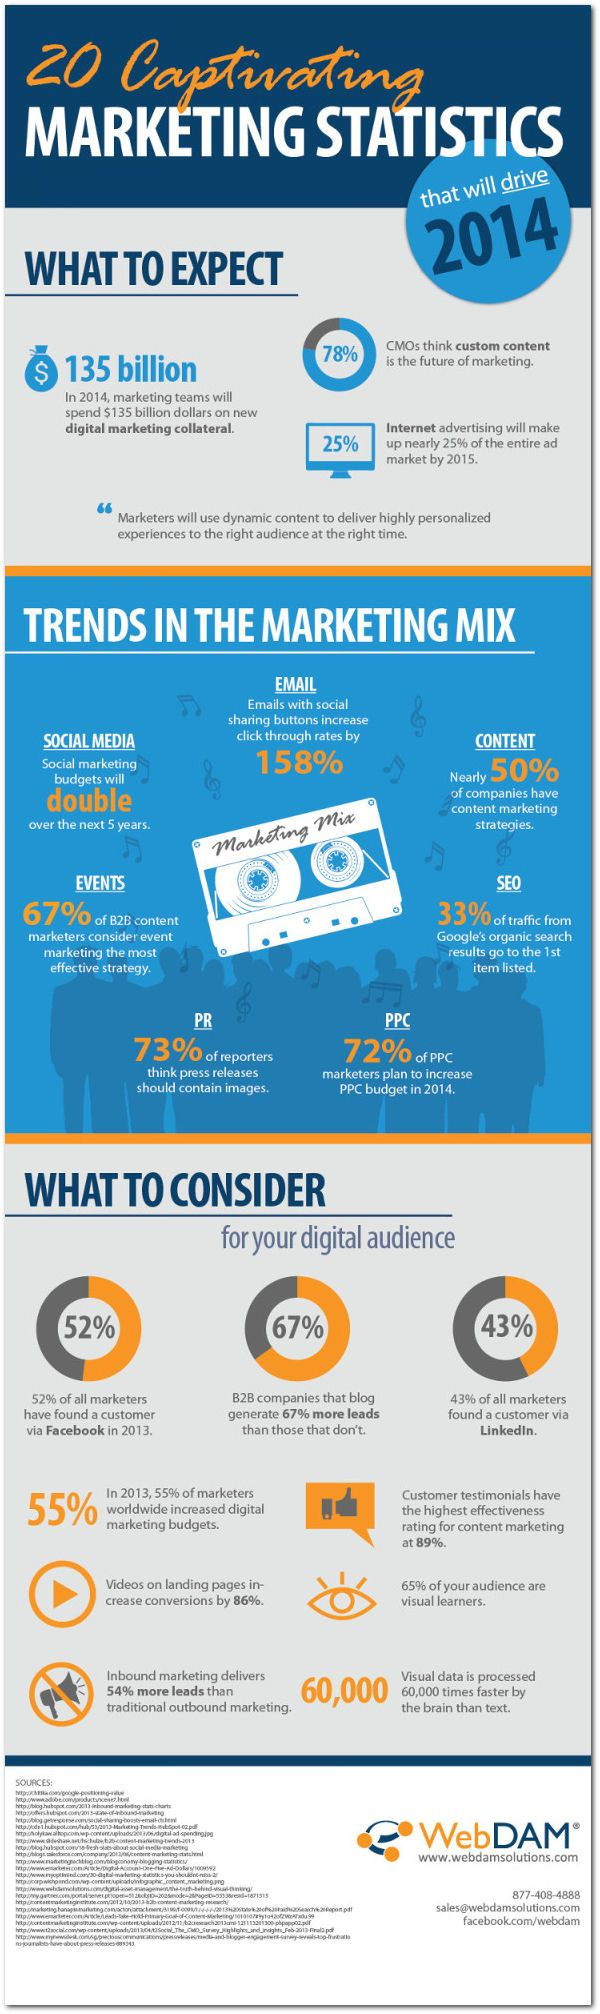 20 Statistics That Will Drive 2014 Marketing Strategies [INFOGRAPHIC]